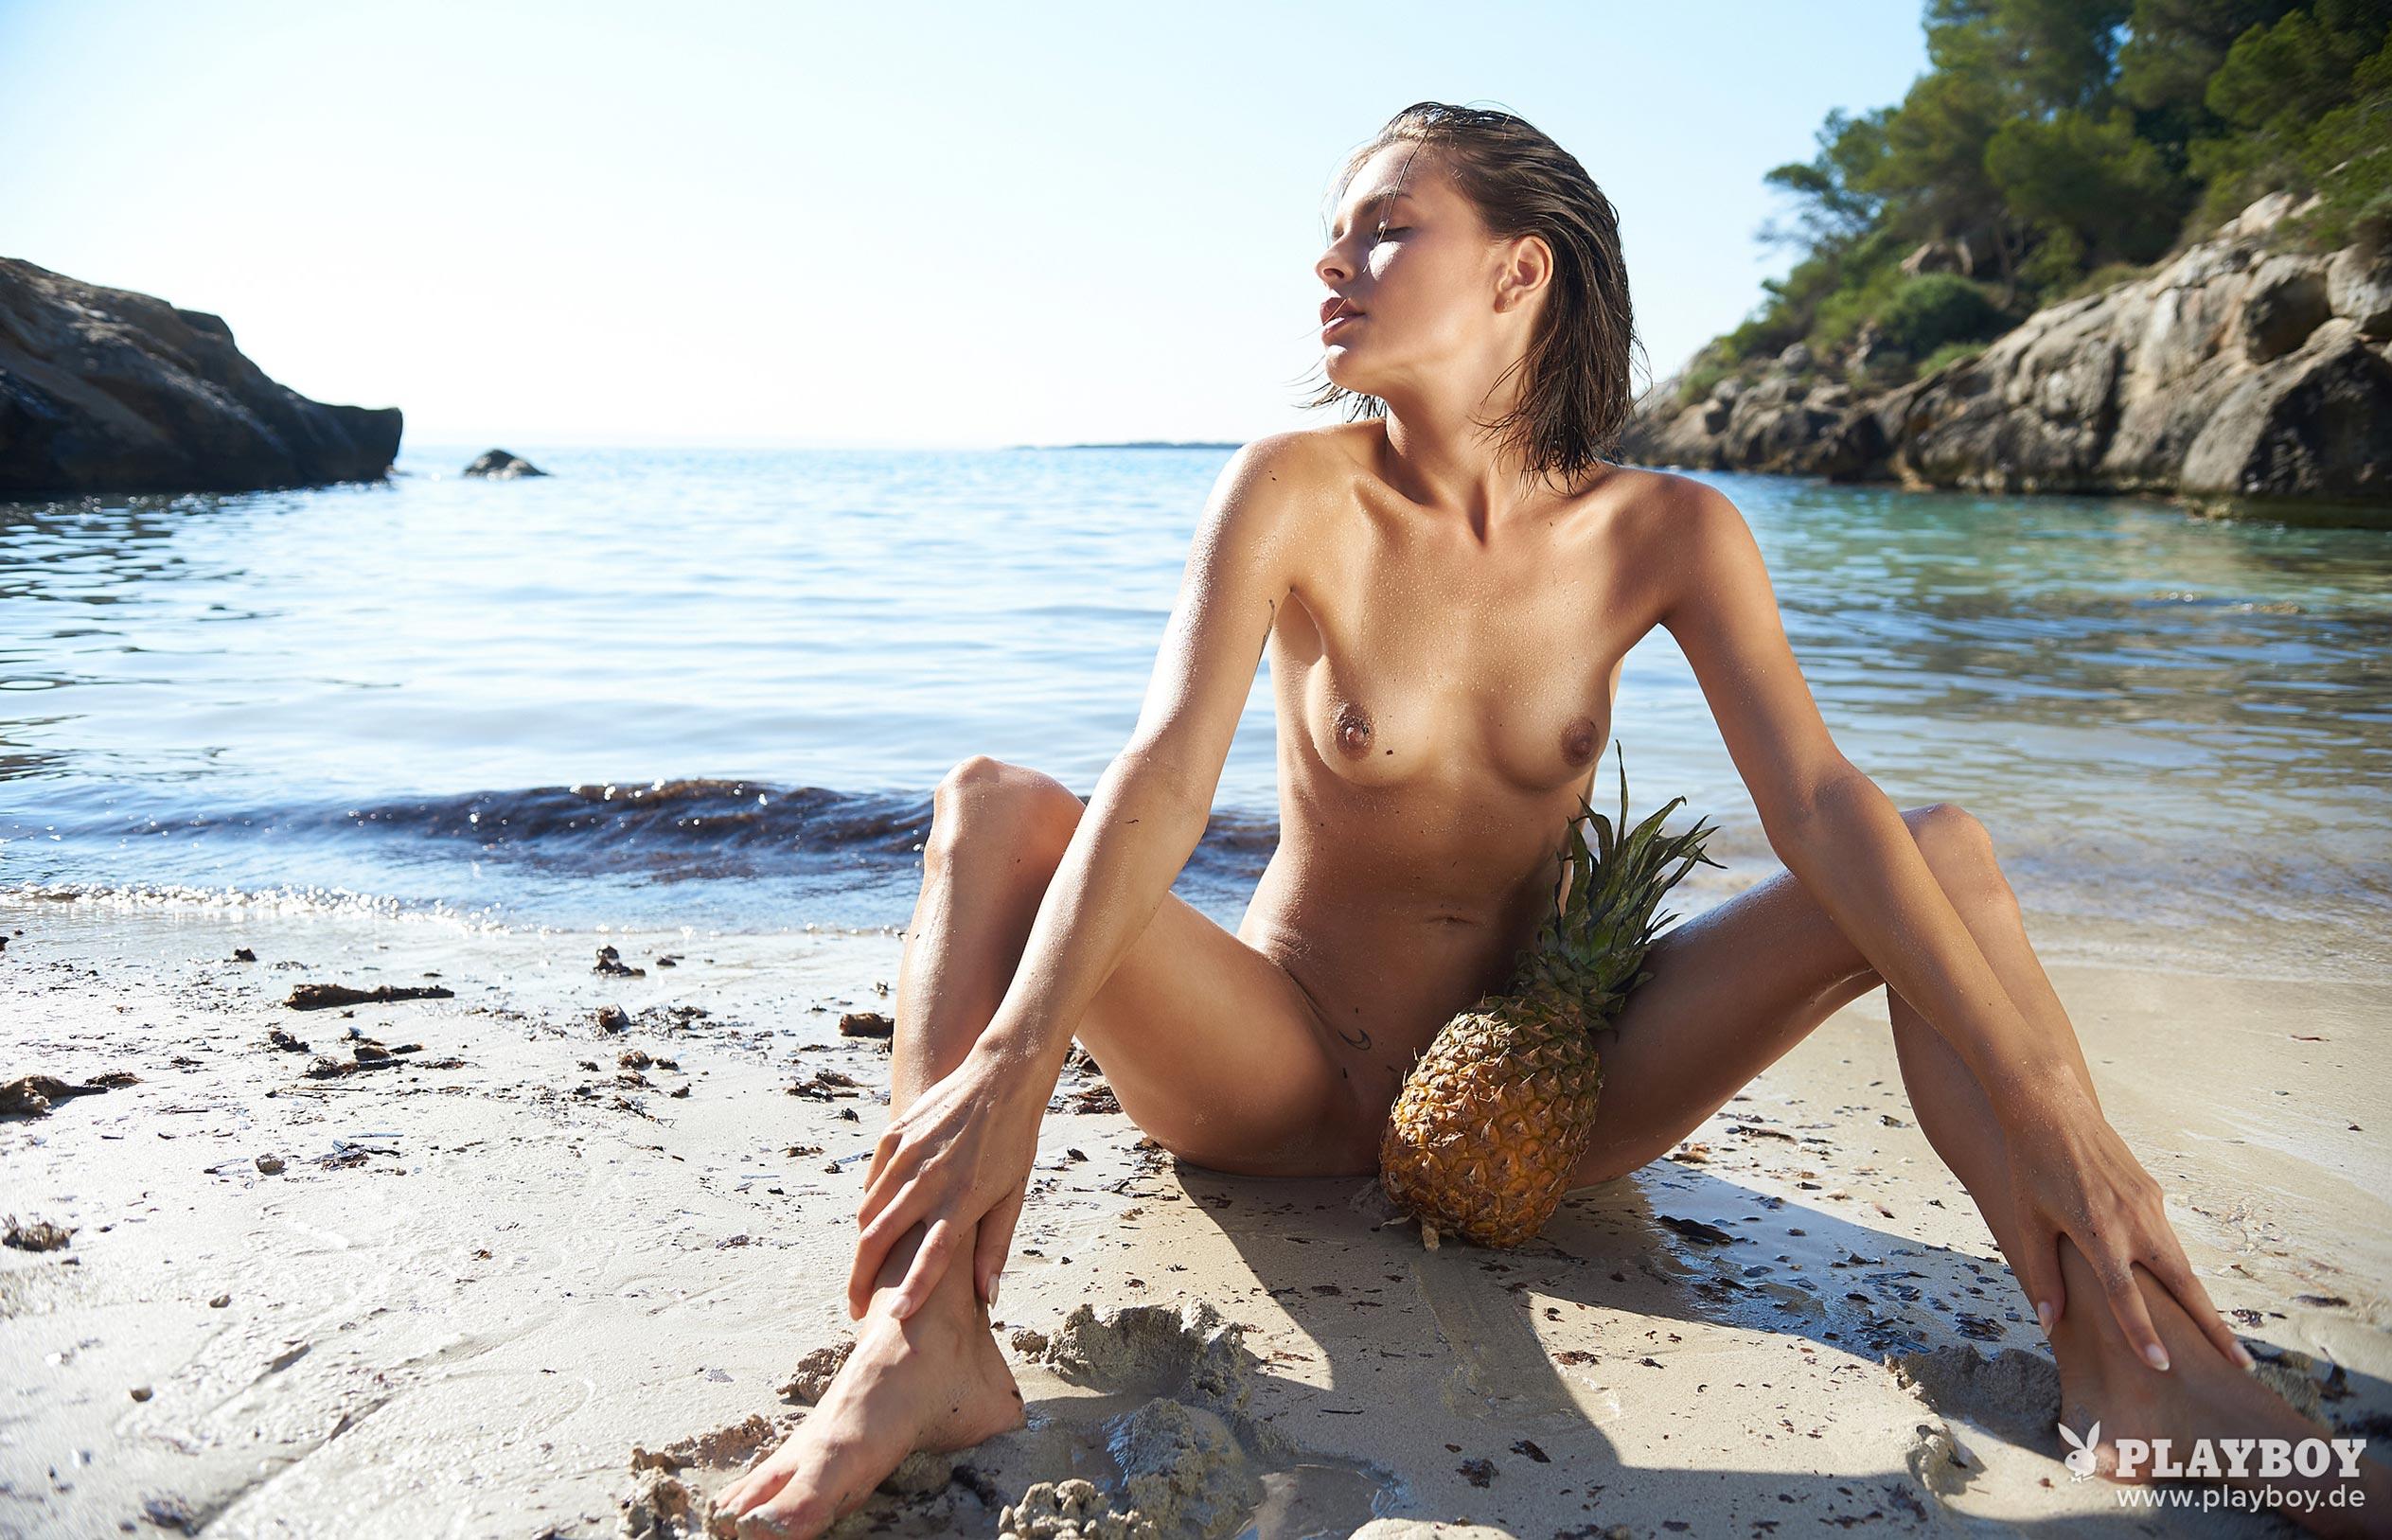 Оливия Пельцер - Девушка месяца Playboy Германия, сентябрь 2018 / фото 02